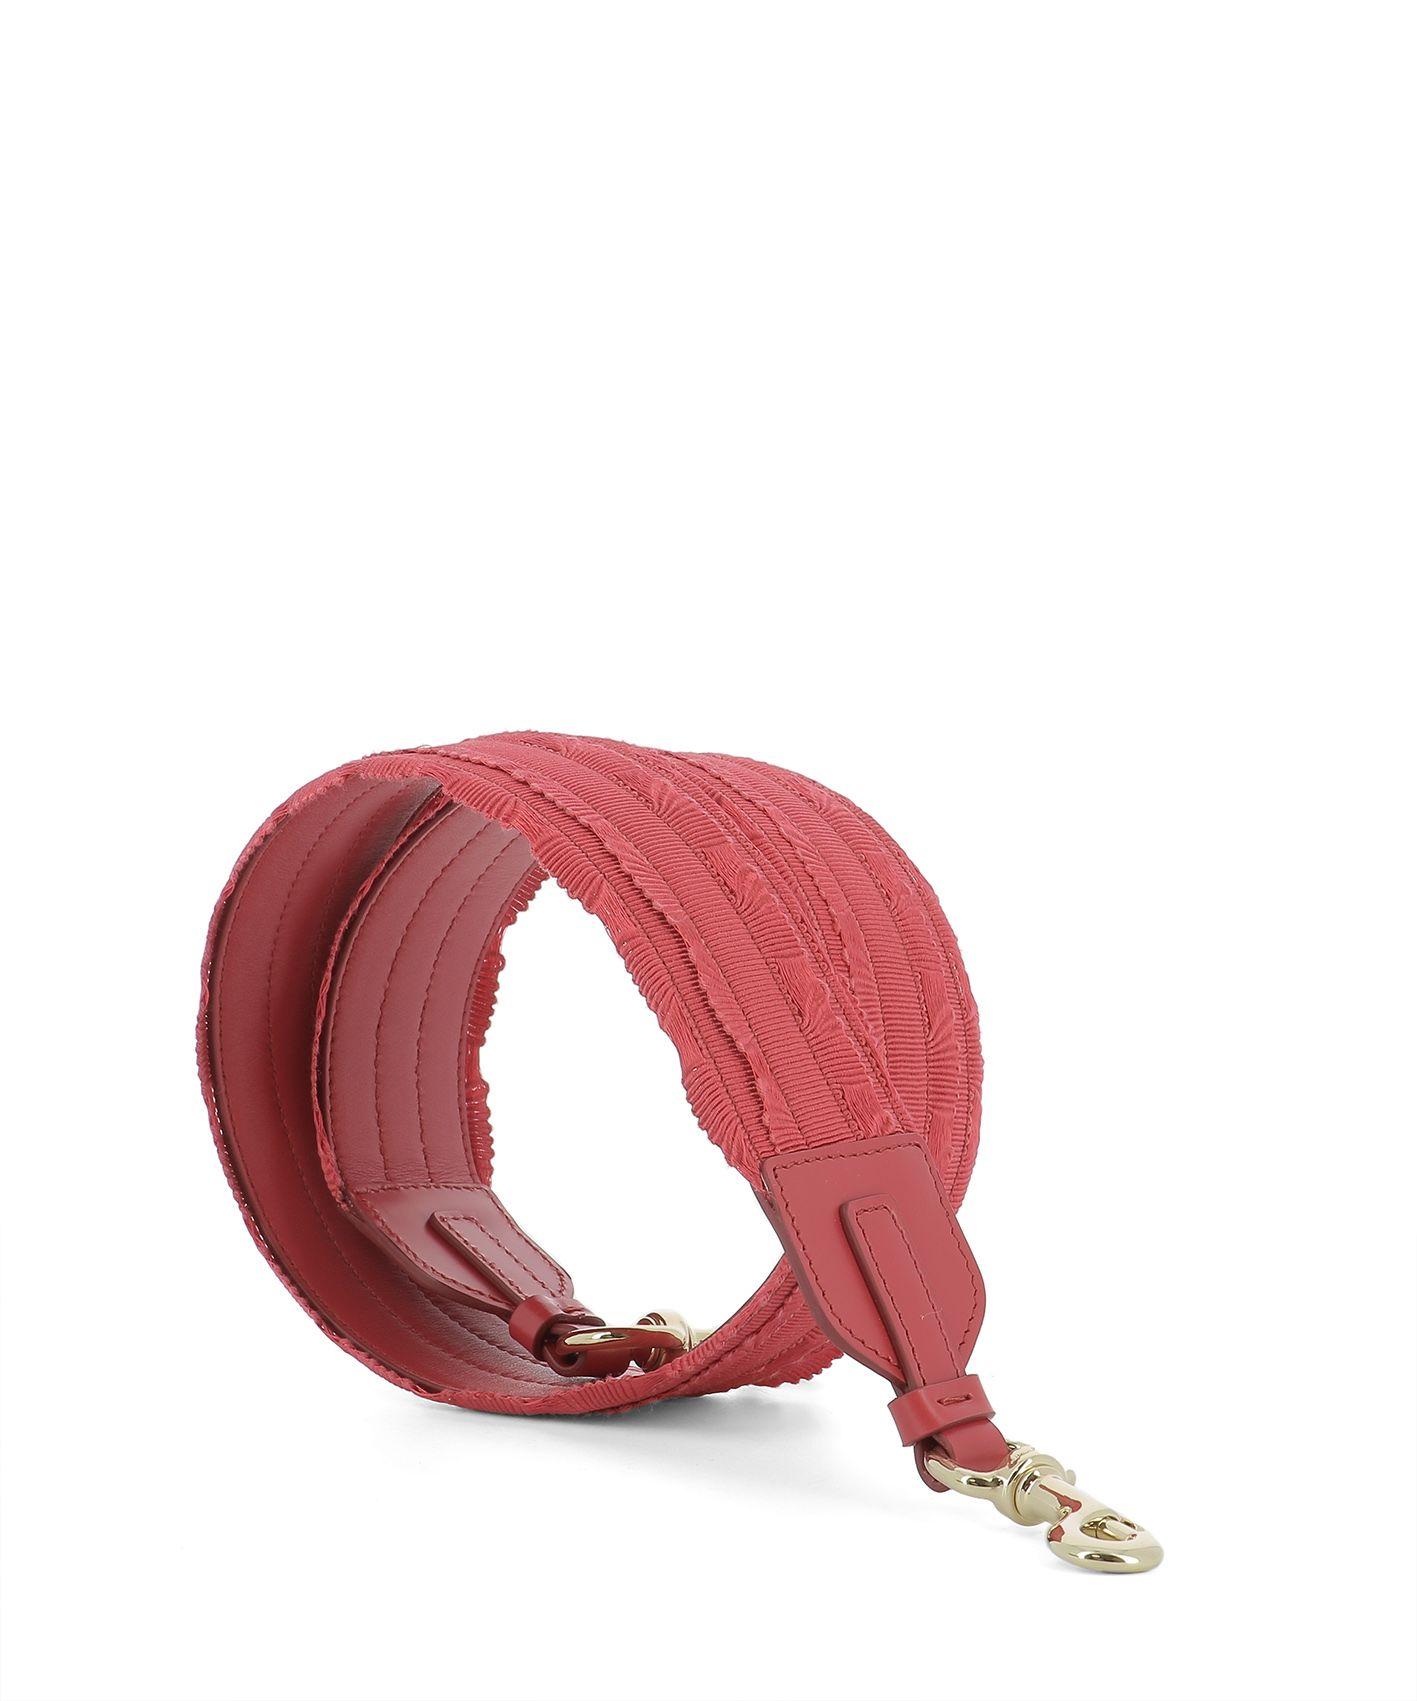 Red Fabric Shoulder Strap